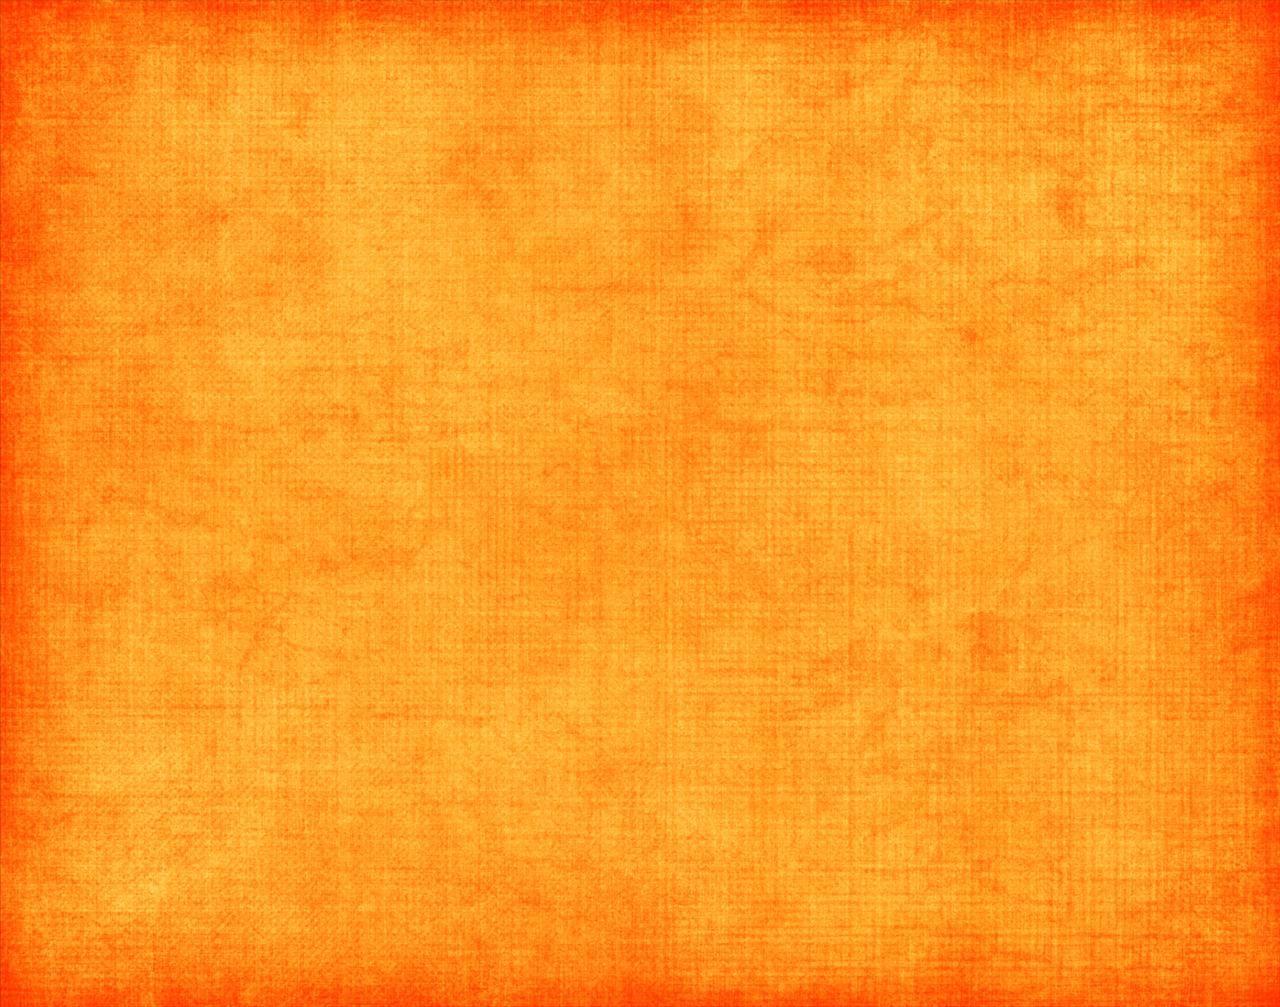 orange wallpaper06 - photo #19